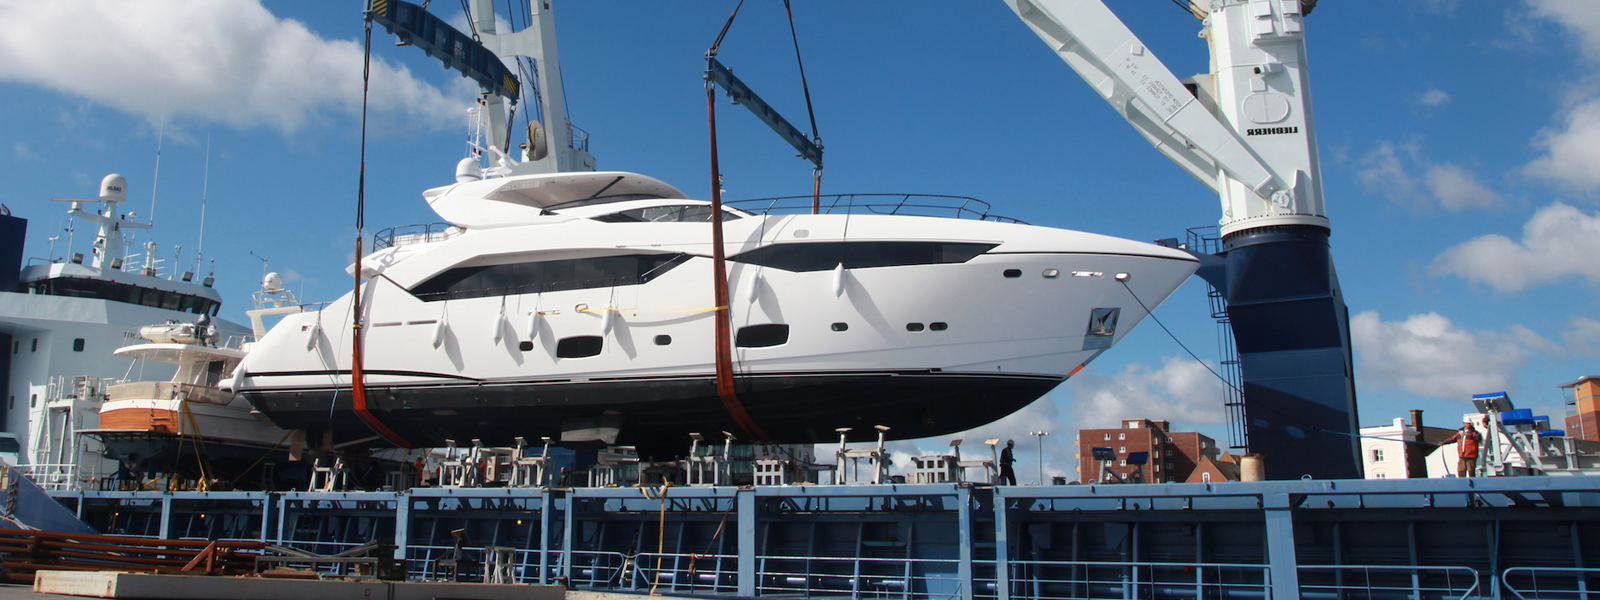 Transportation by Carine Yachts